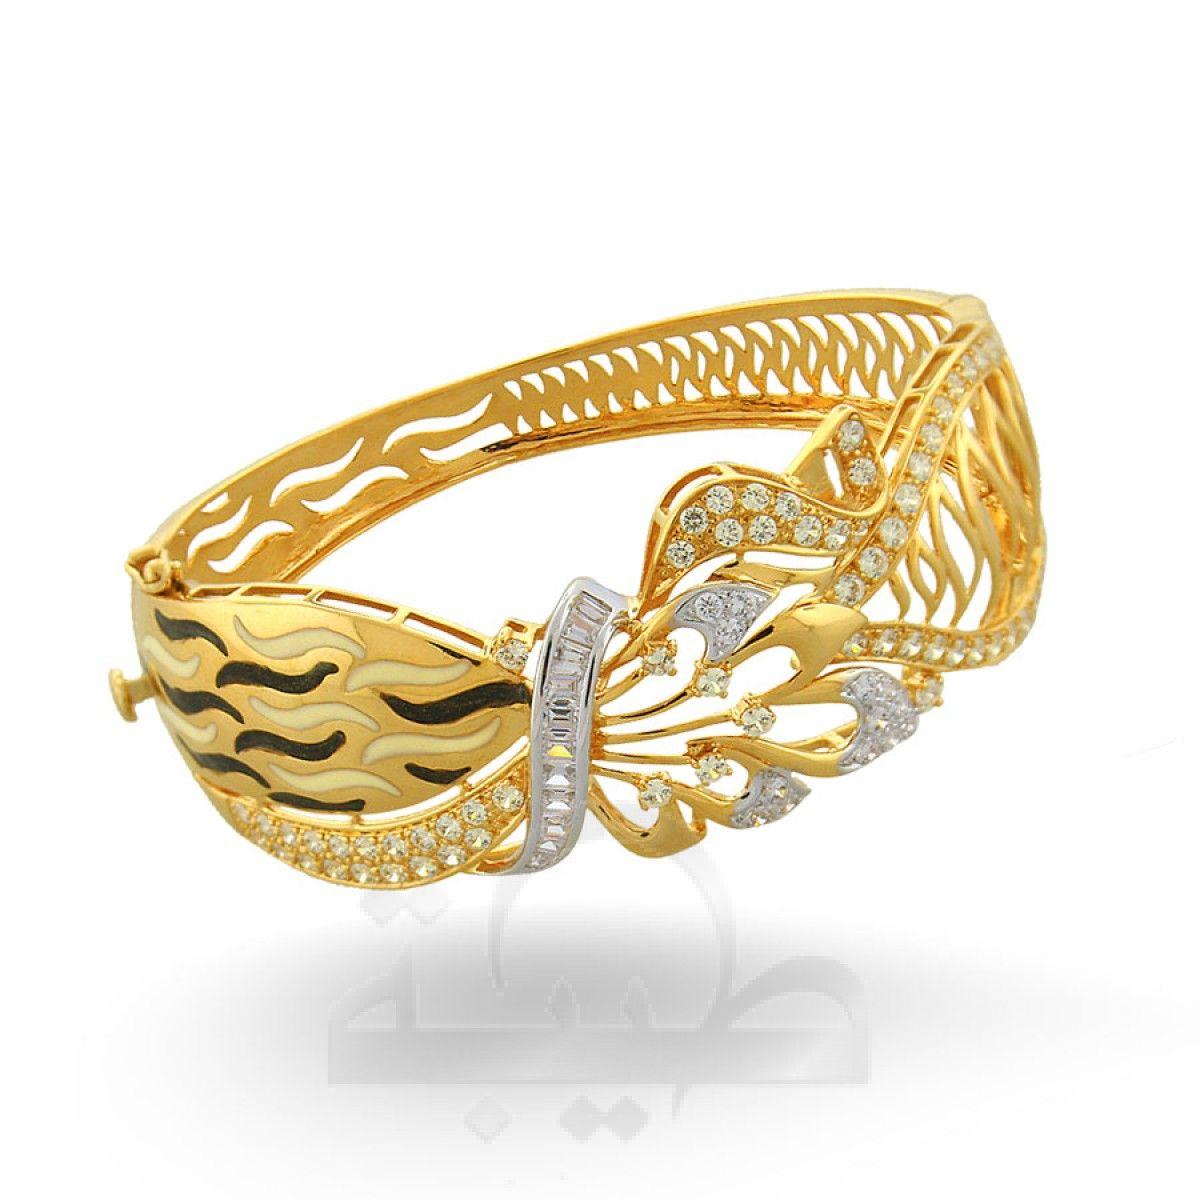 Wide Bangle-c447 | JeWeLlZ | Pinterest | Bangle, Gold jewellery ...